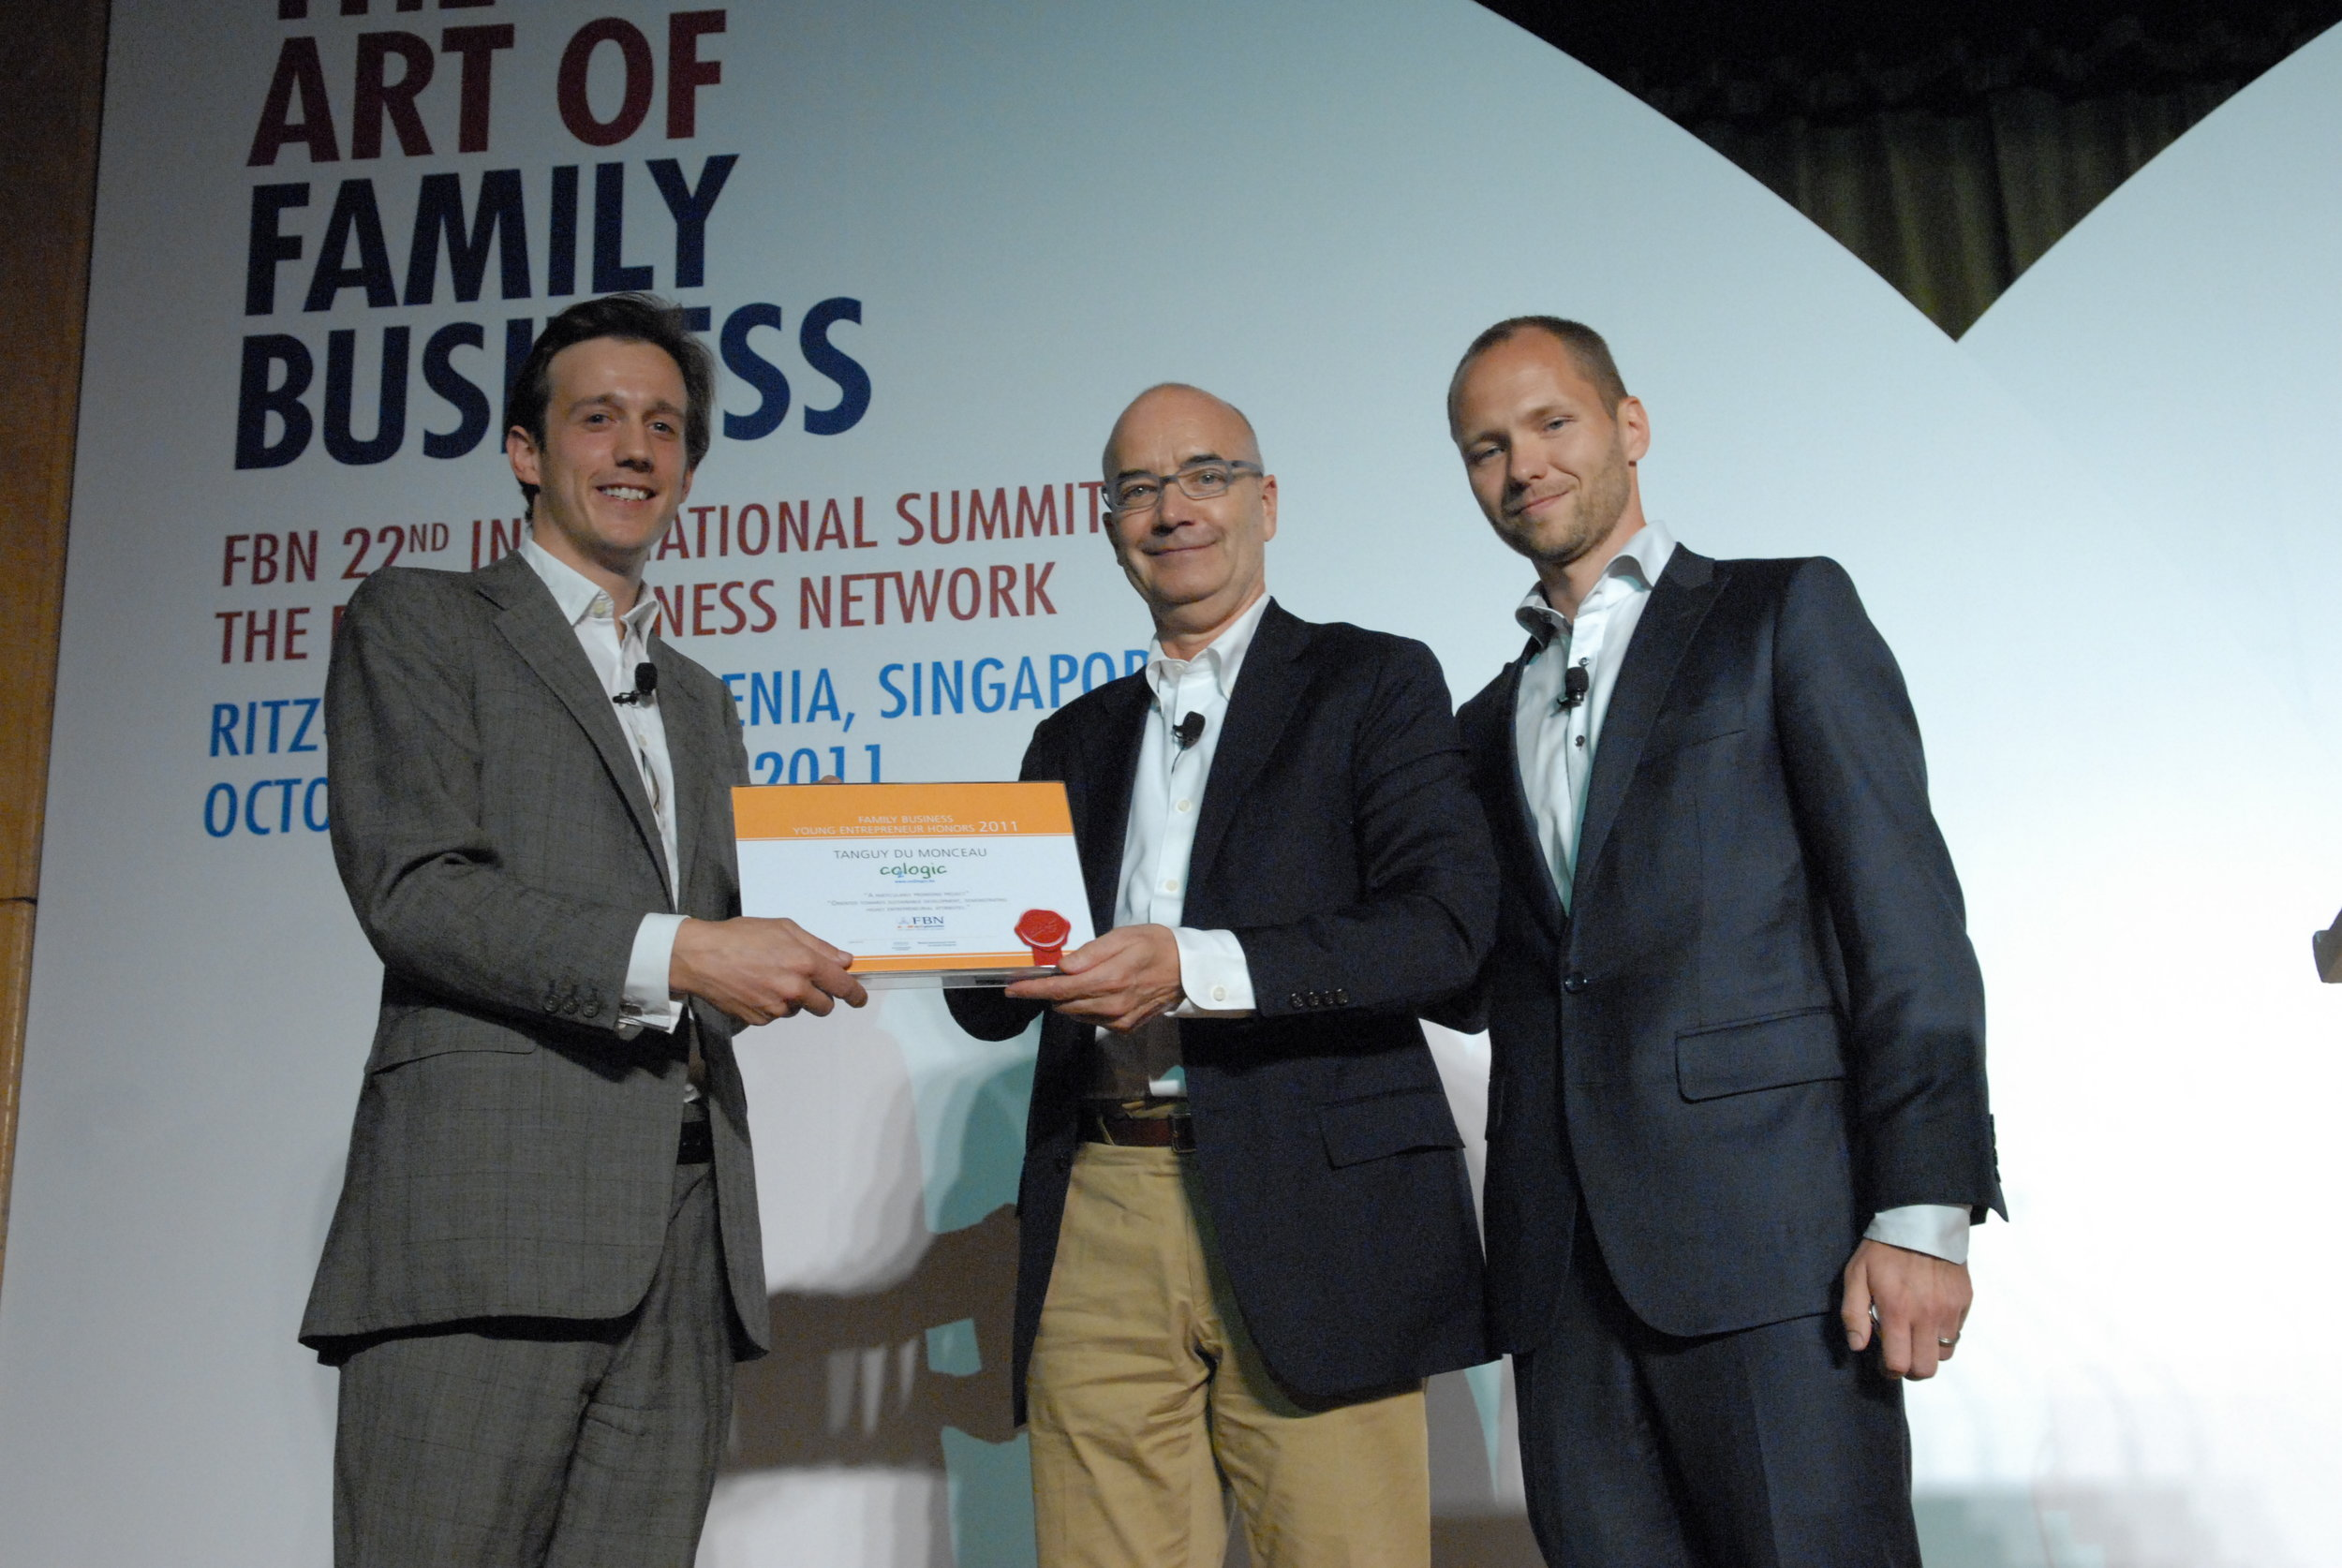 FBN 22nd International Summit in Singapore